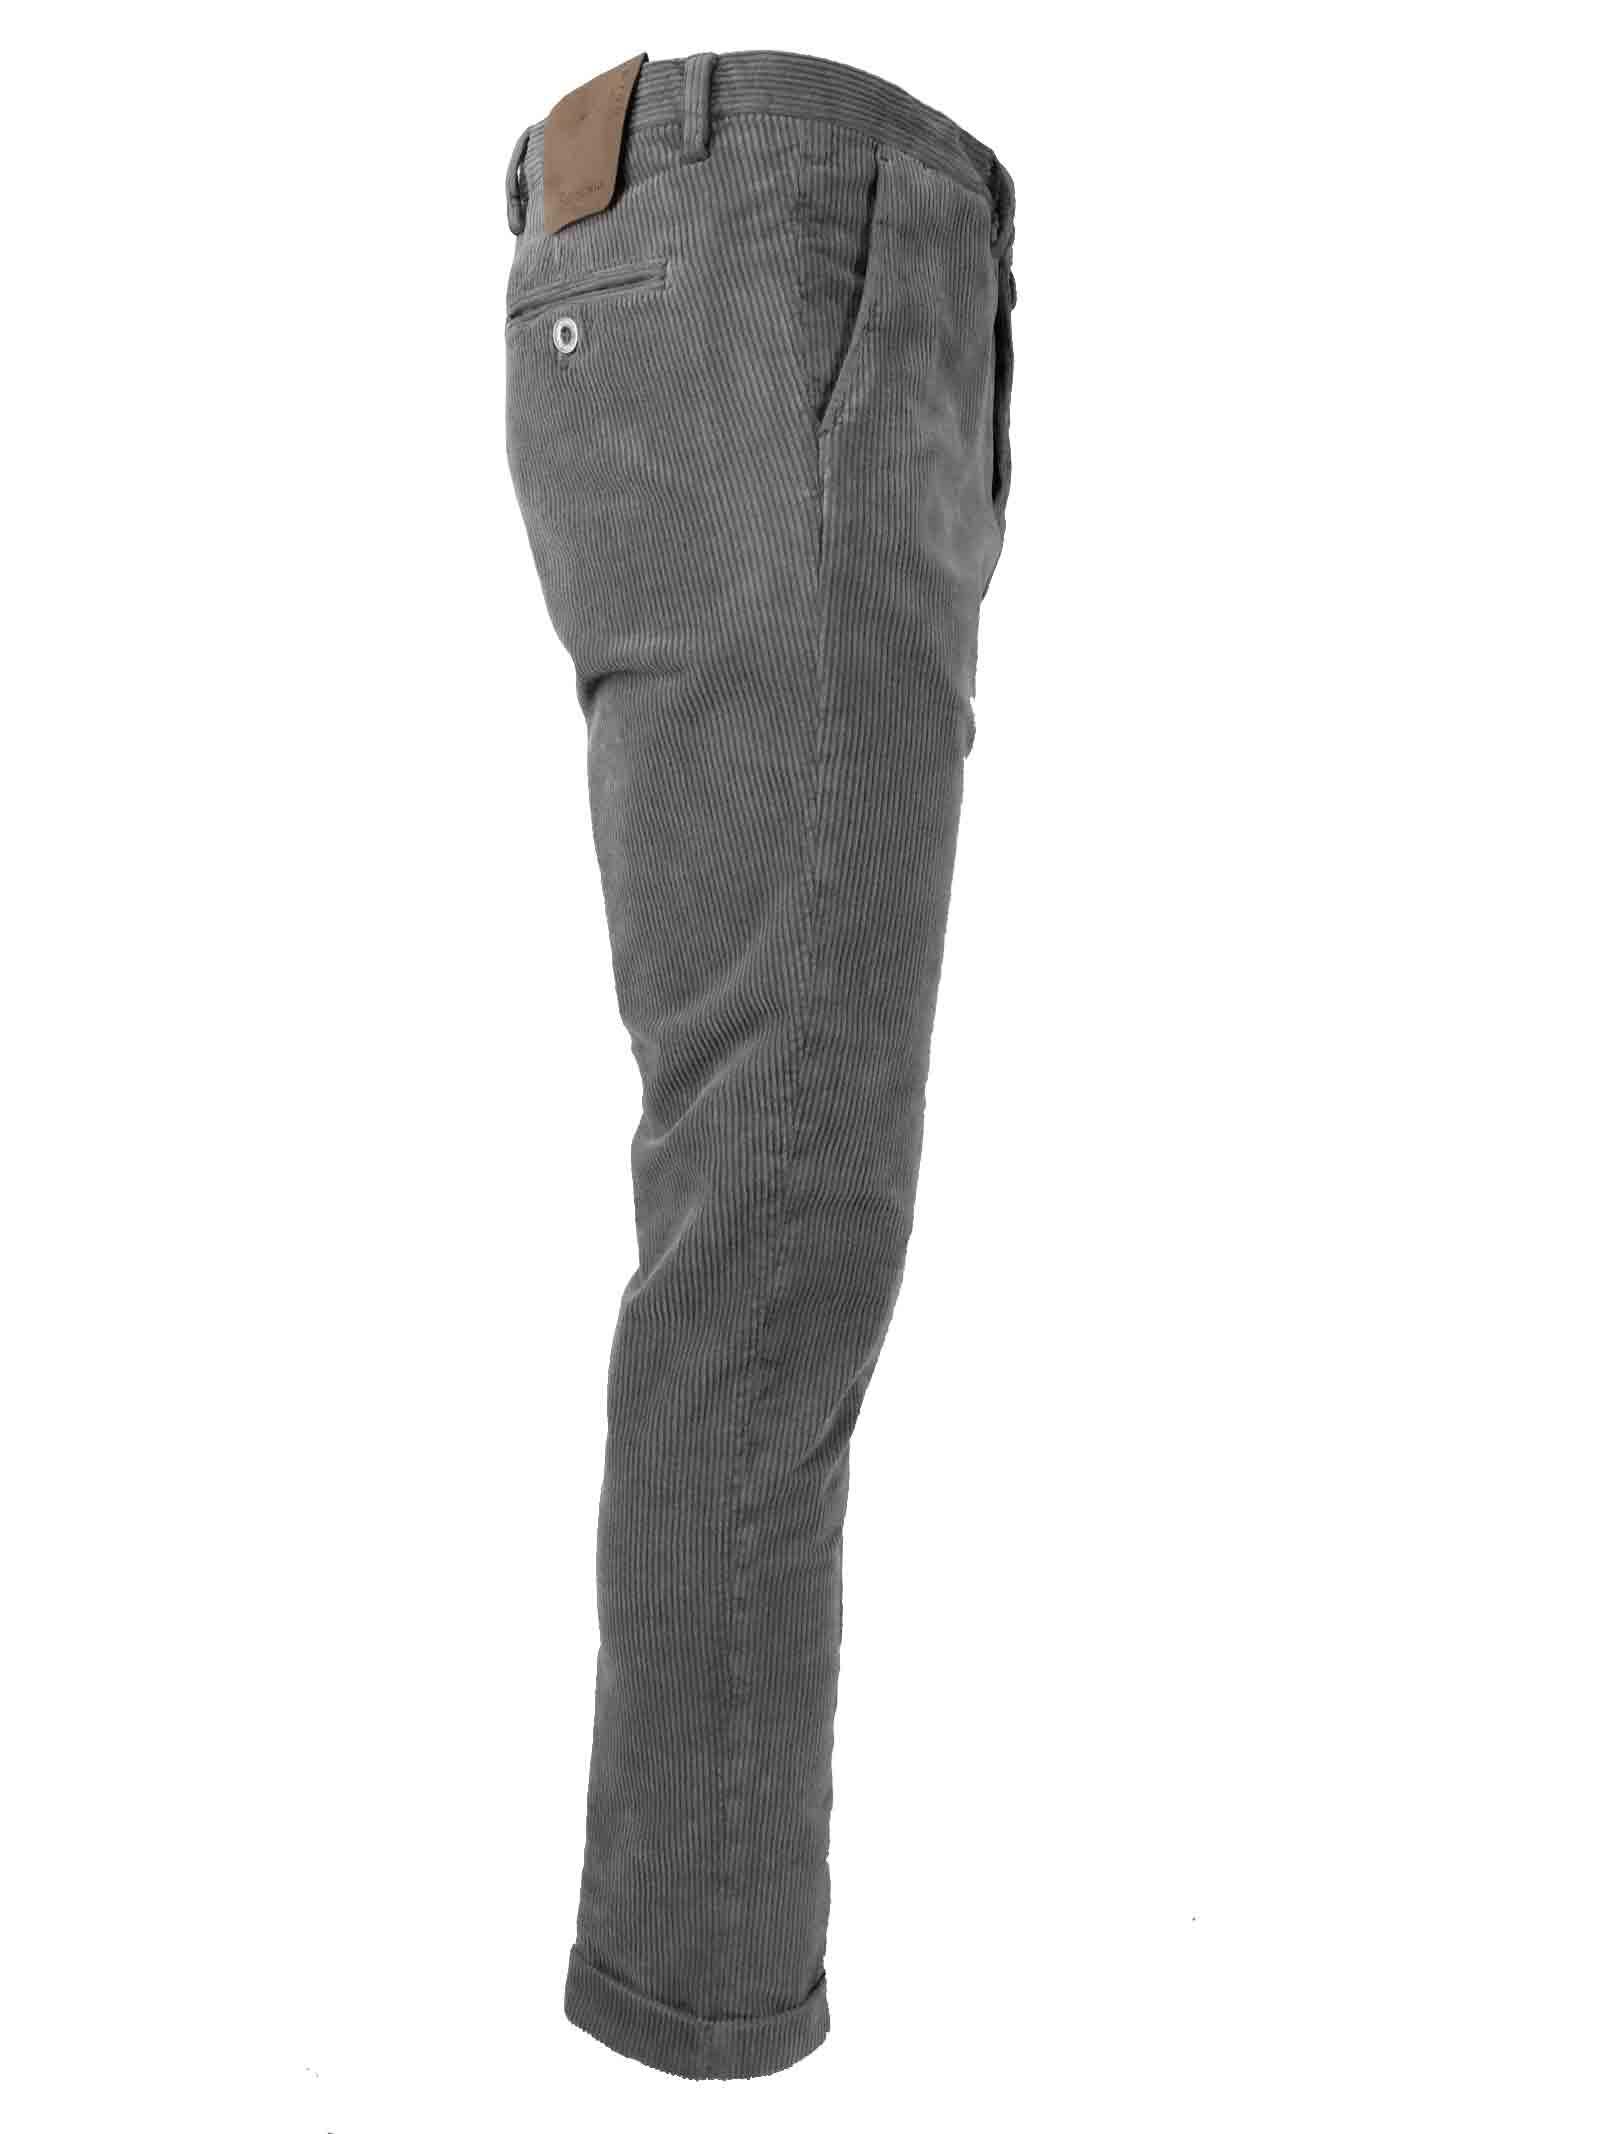 B700 | Trousers | MH700 800643